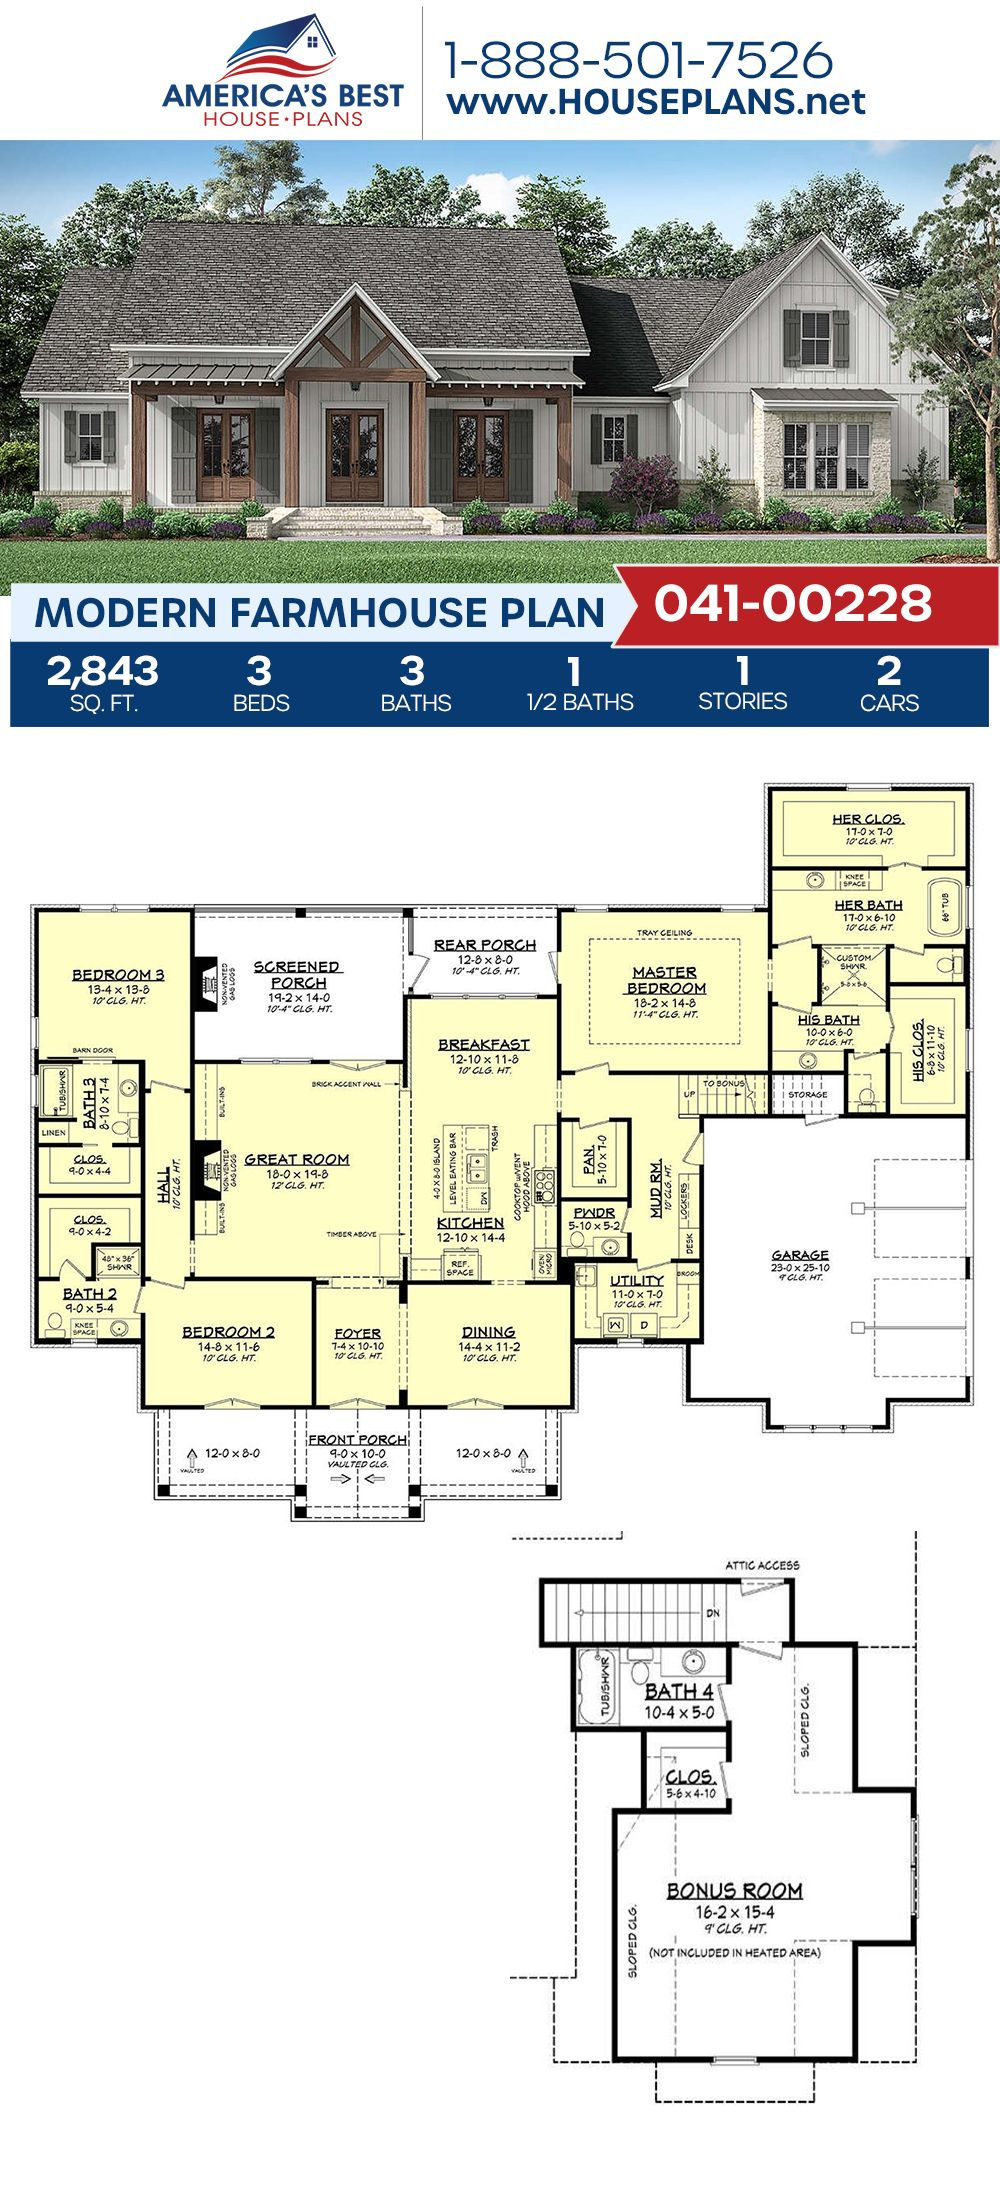 House Plan 041 00228 Modern Farmhouse Plan 2 843 Square Feet 3 Bedrooms 3 5 Bathrooms Modern Farmhouse Plans House Plans Farmhouse Farmhouse Plans